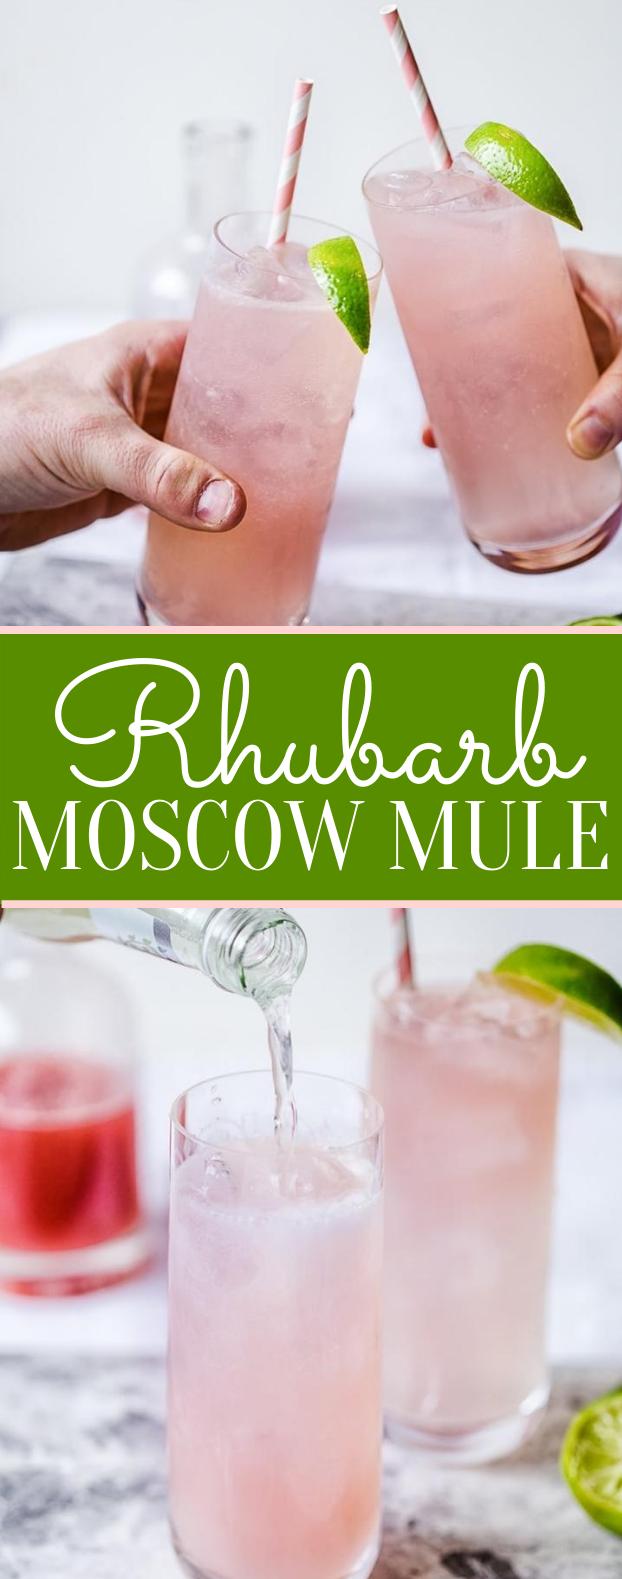 RHUBARB MOSCOW MULE #drinks #freshdrink #cocktails #vodka #summerdrink